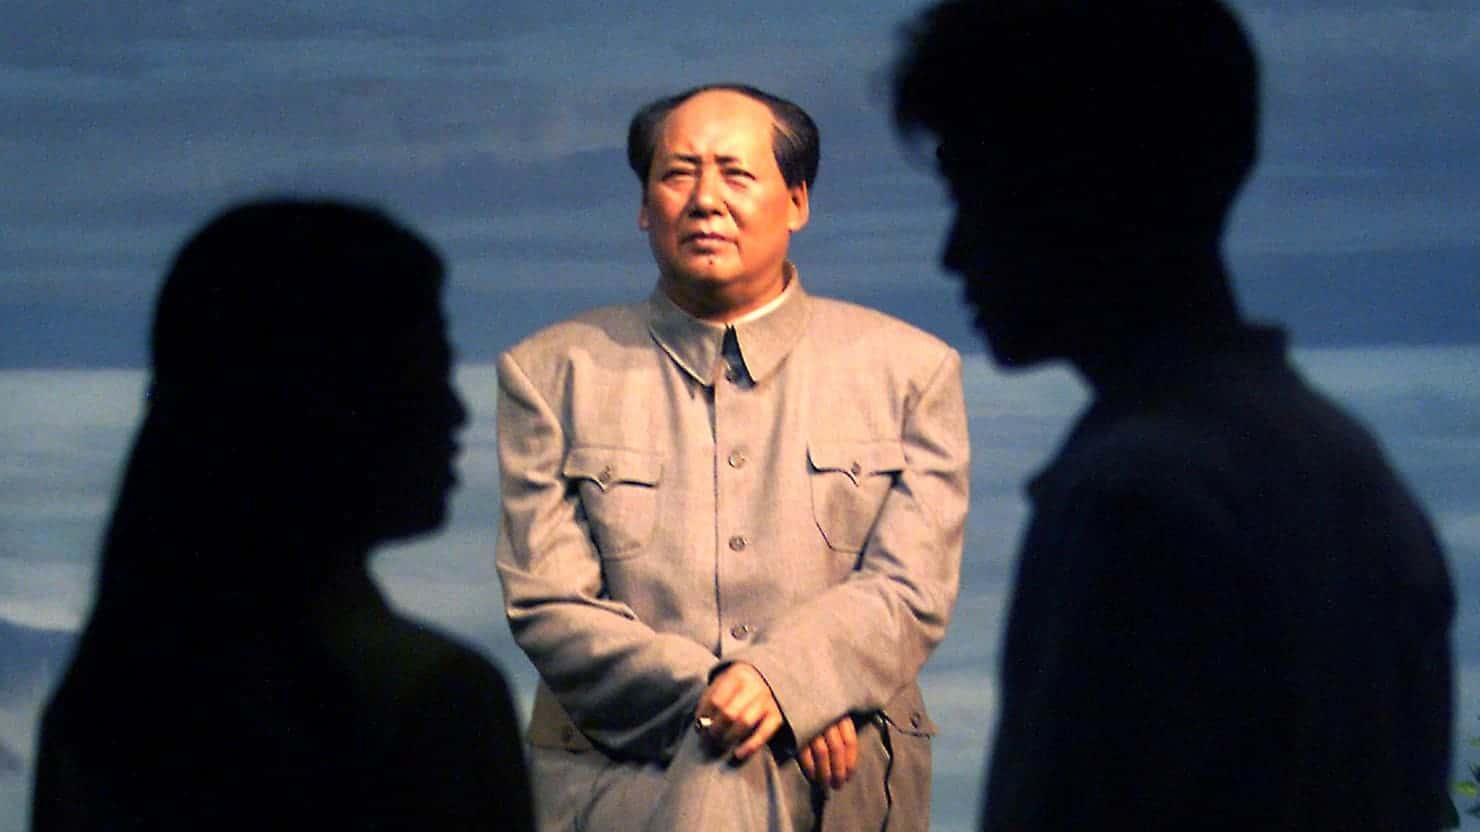 Chairman Mao facts